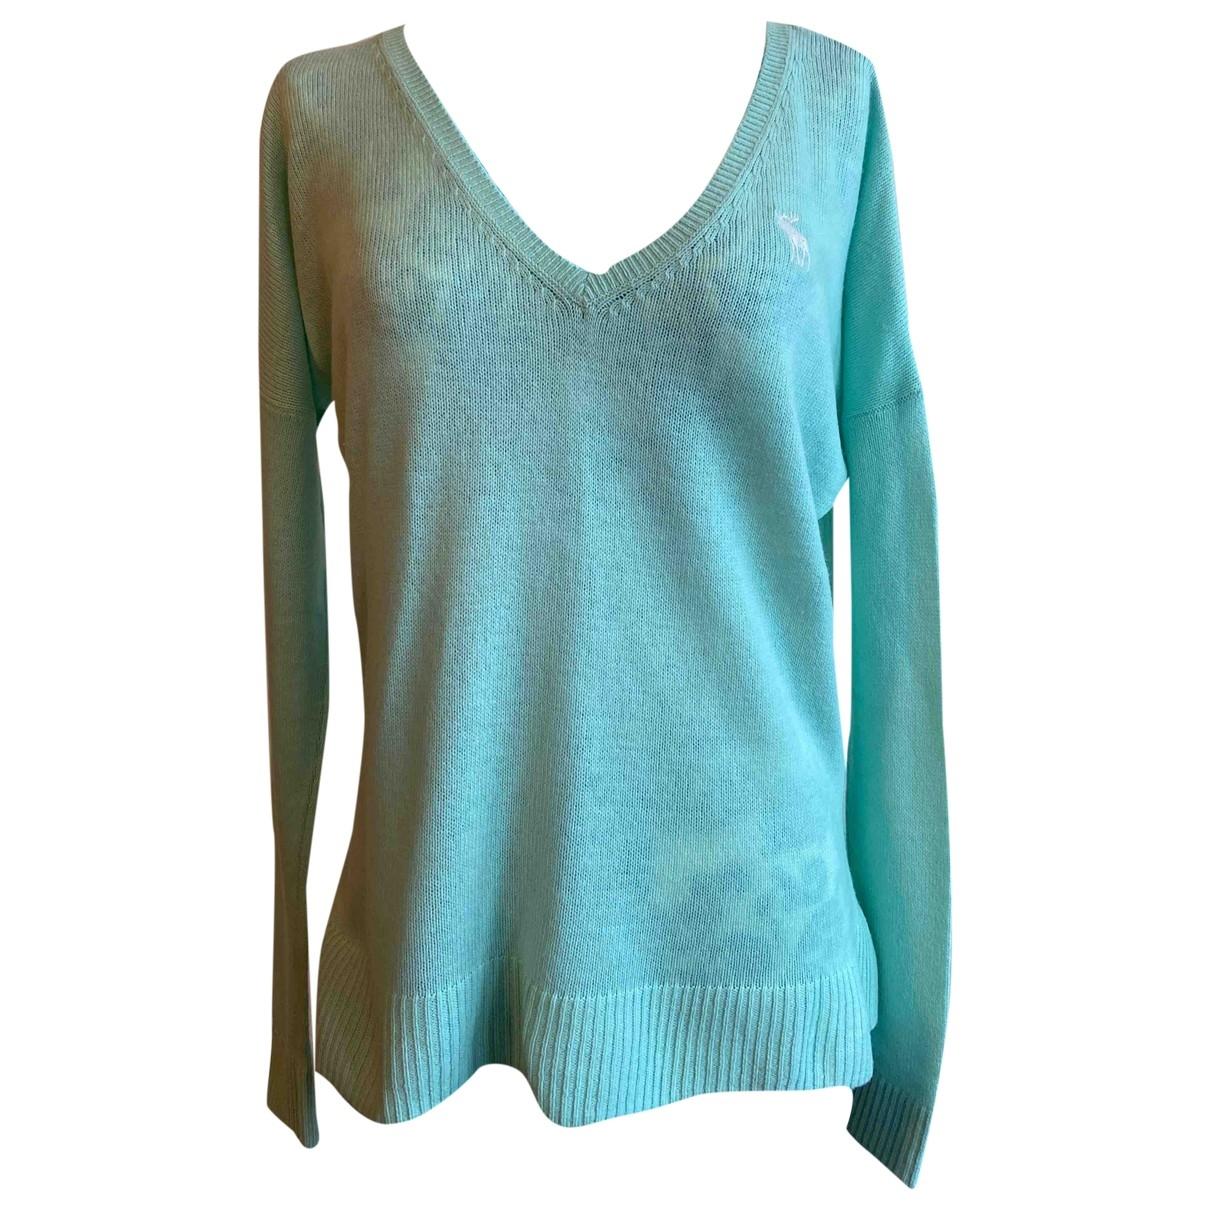 Abercrombie & Fitch \N Turquoise Wool Knitwear for Women XS International